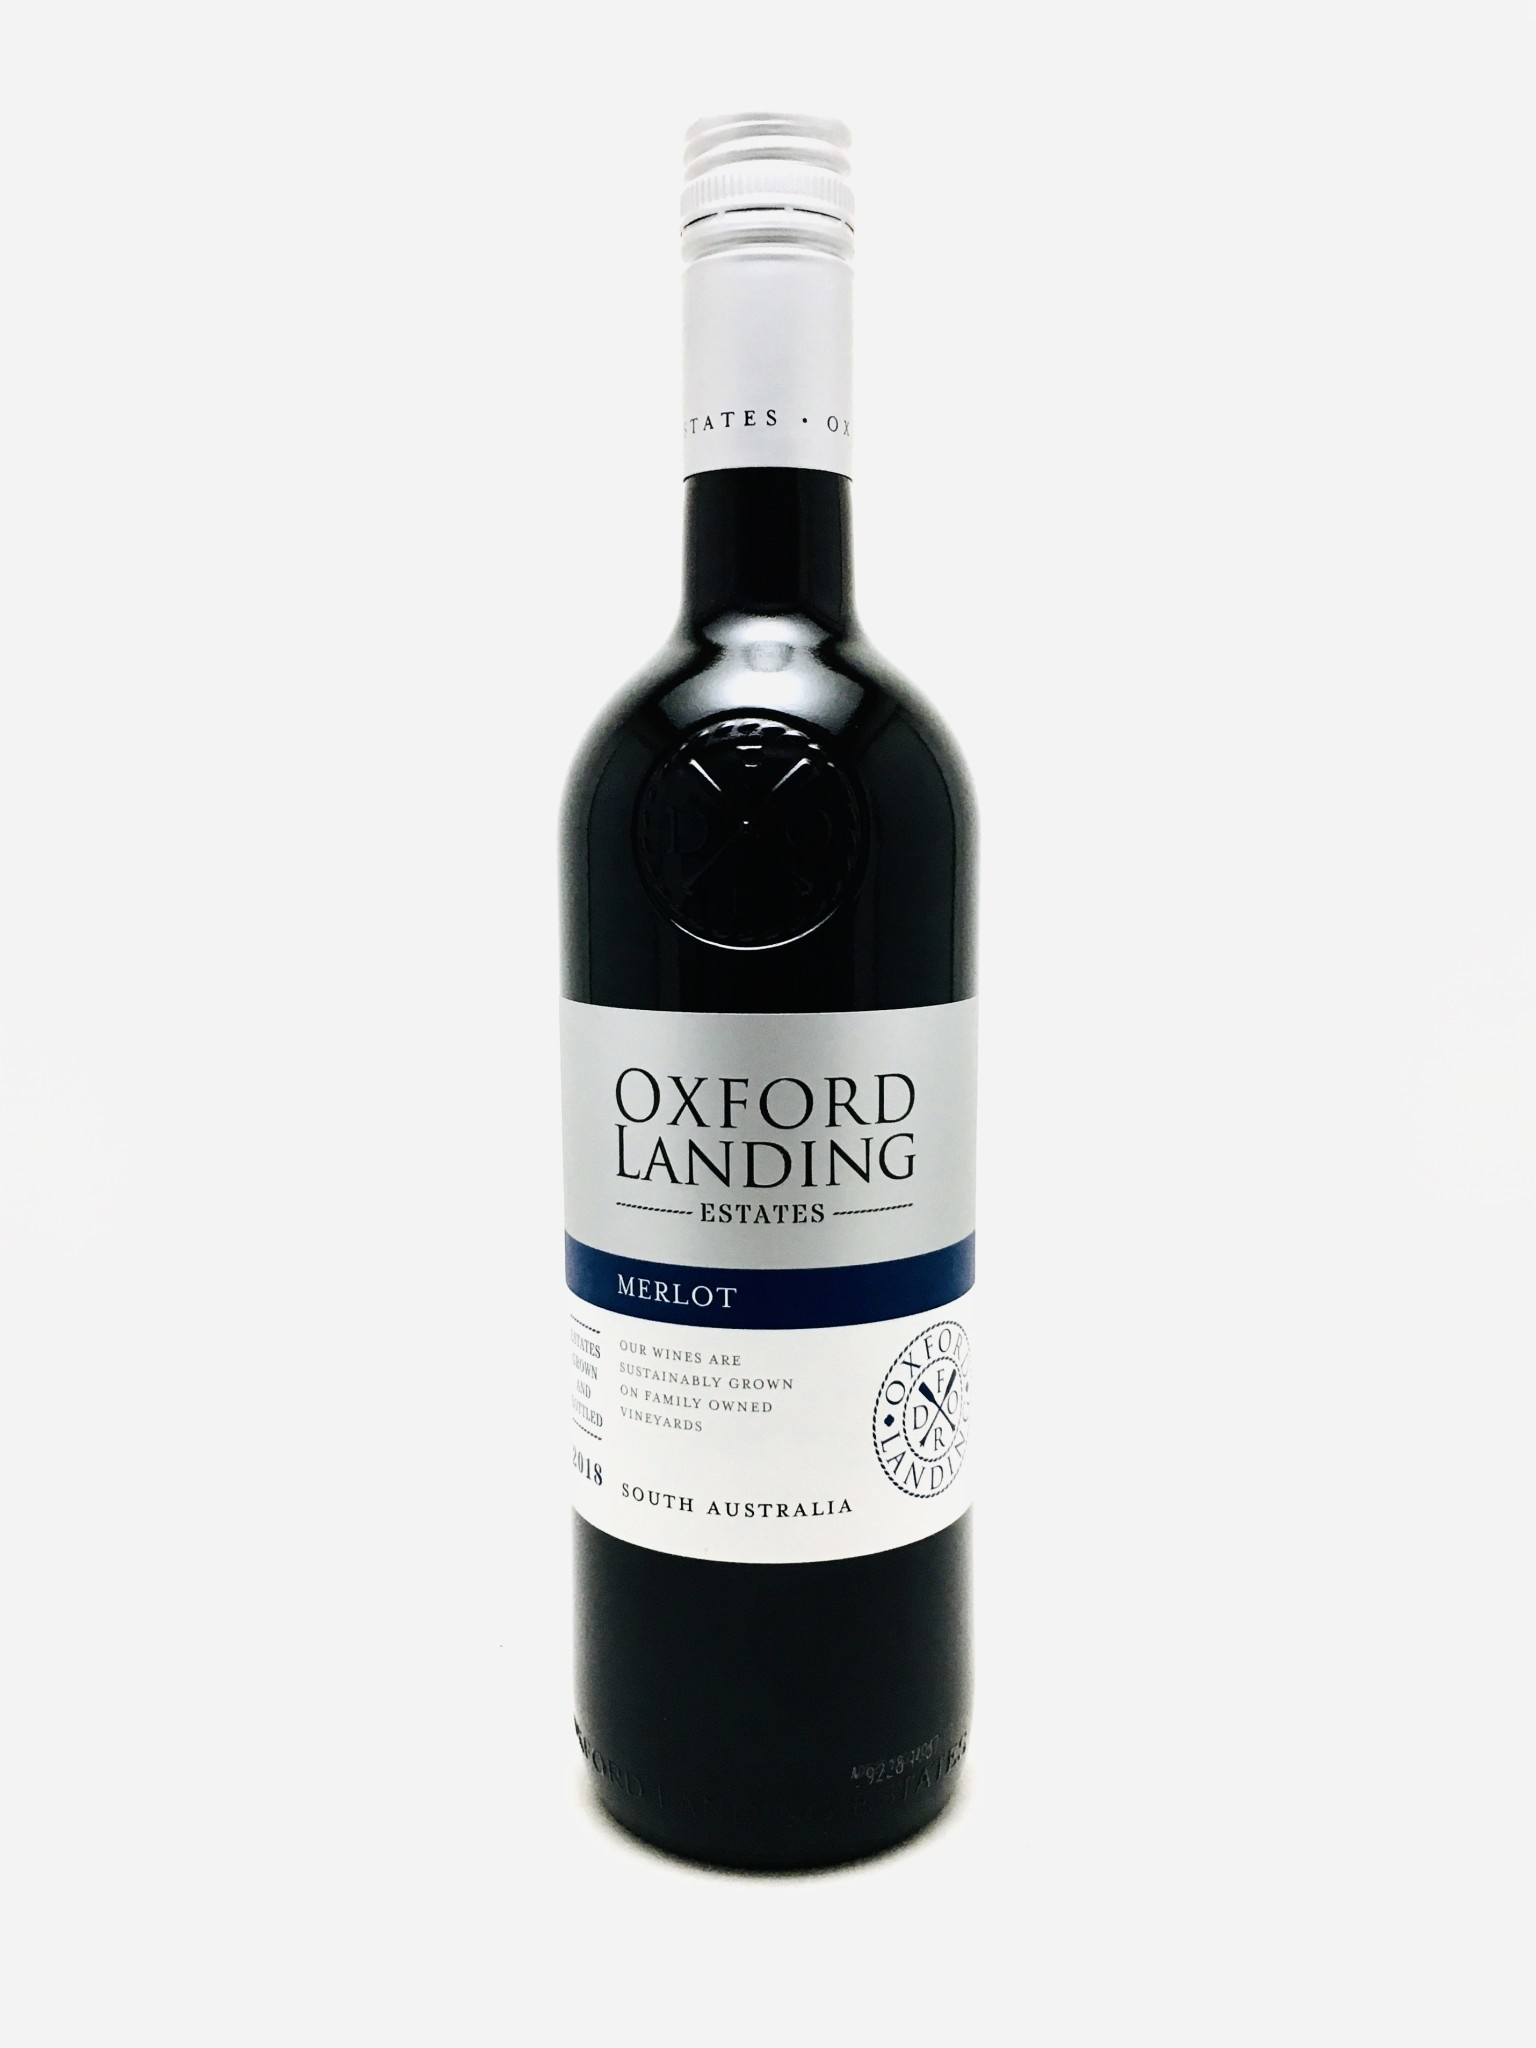 Oxford Landing Estates Merlot South Australia Australia 2018